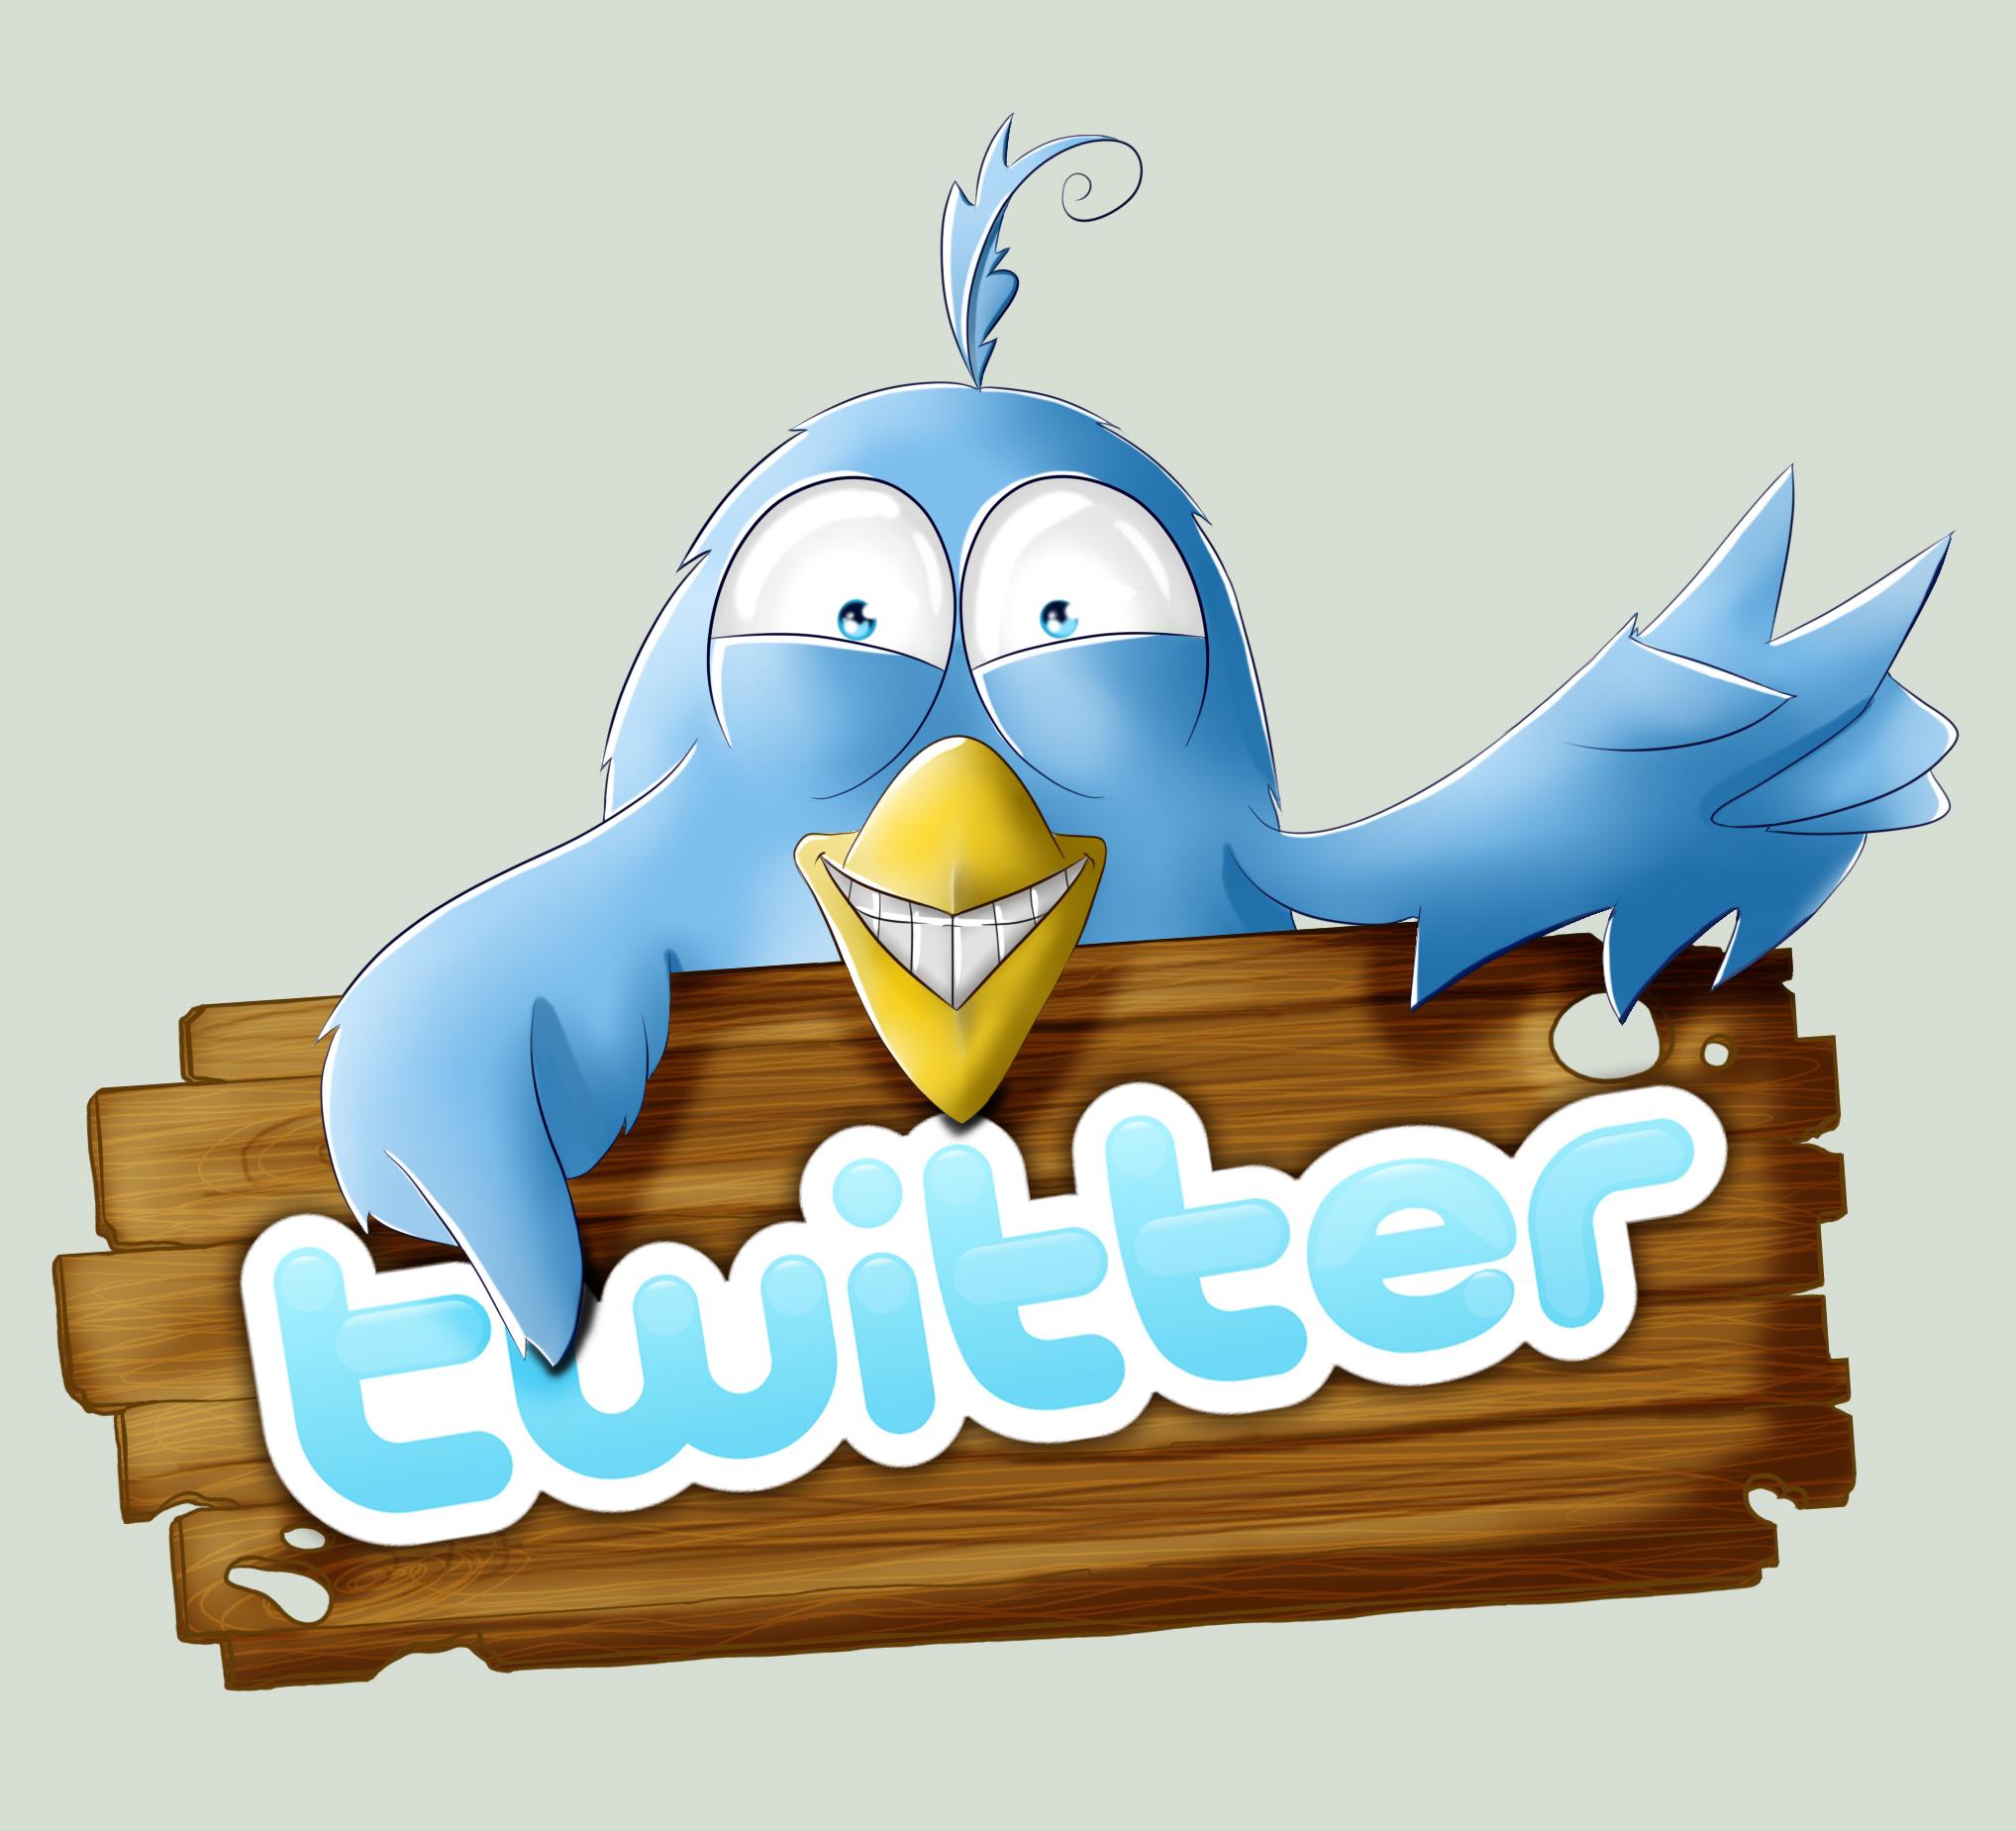 logo-twitter-insideiim